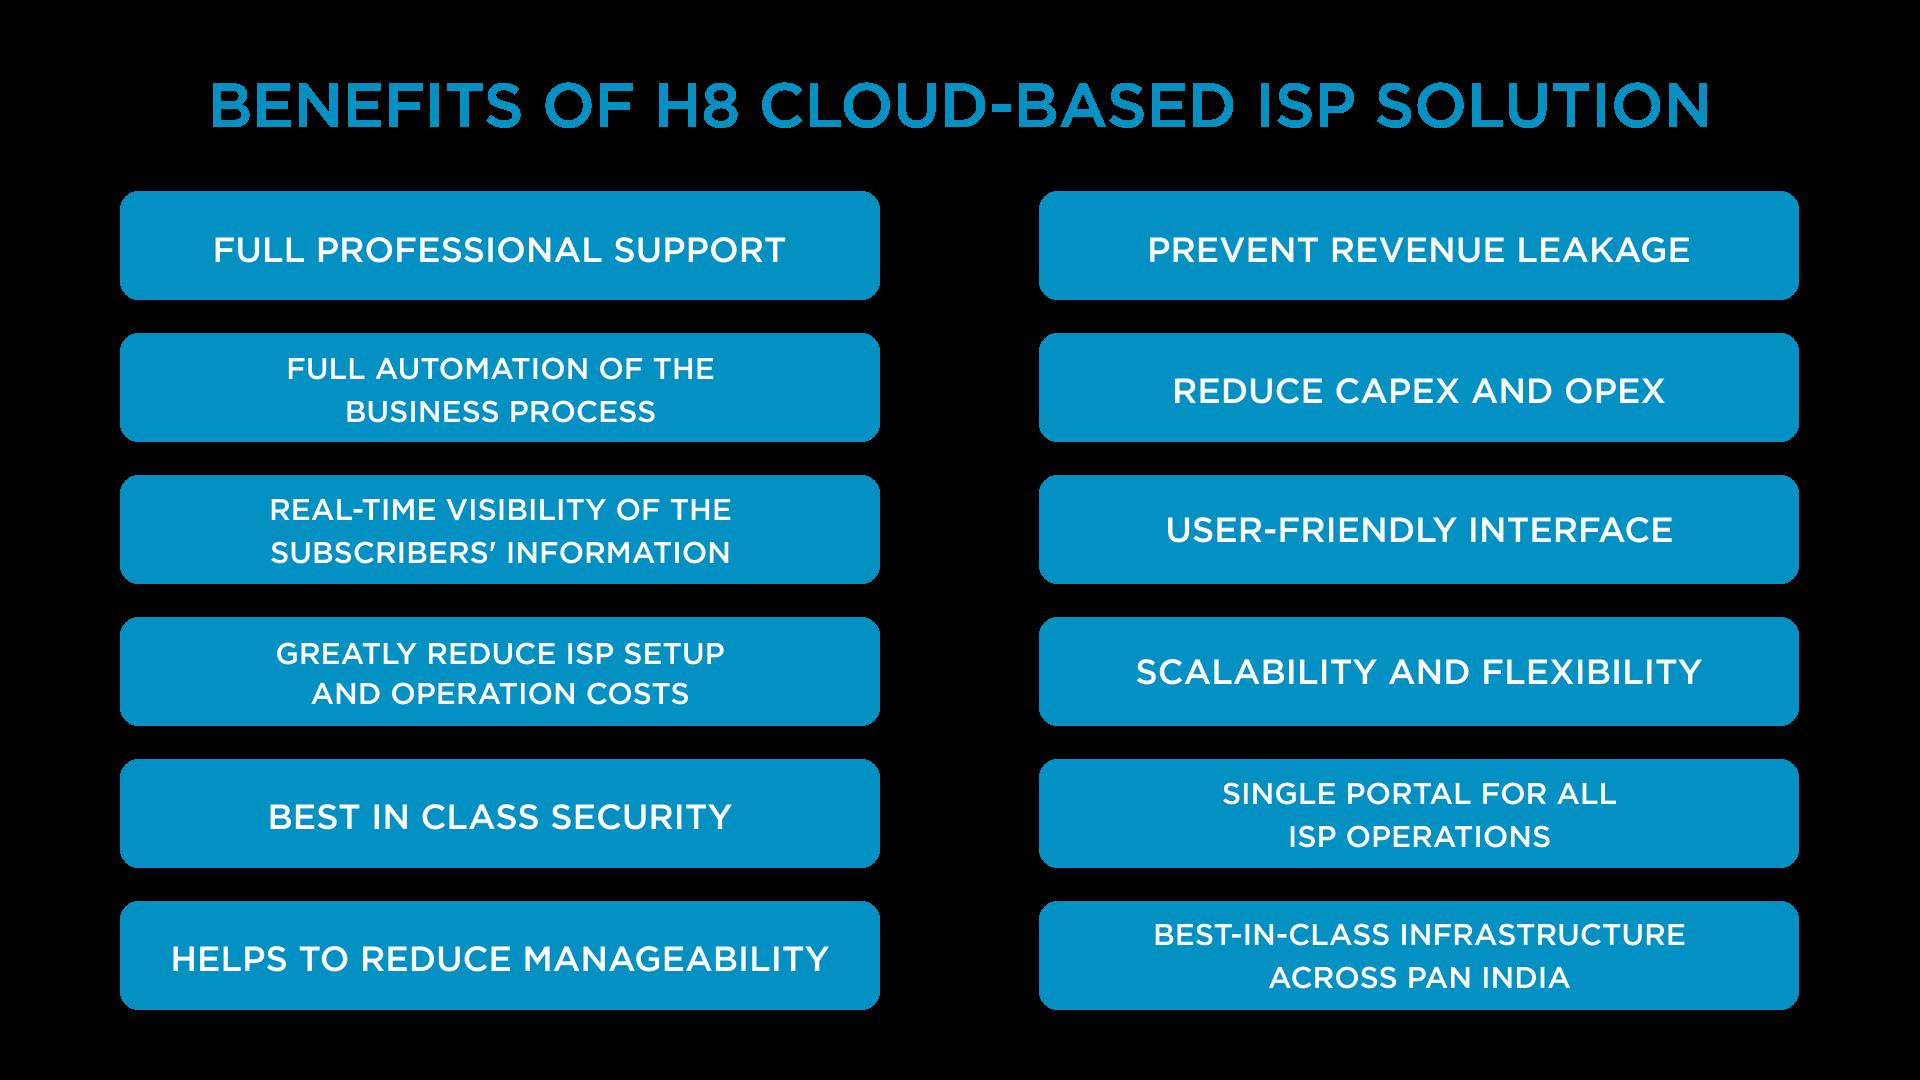 Benefits of H8 Cloud-based ISP Solution